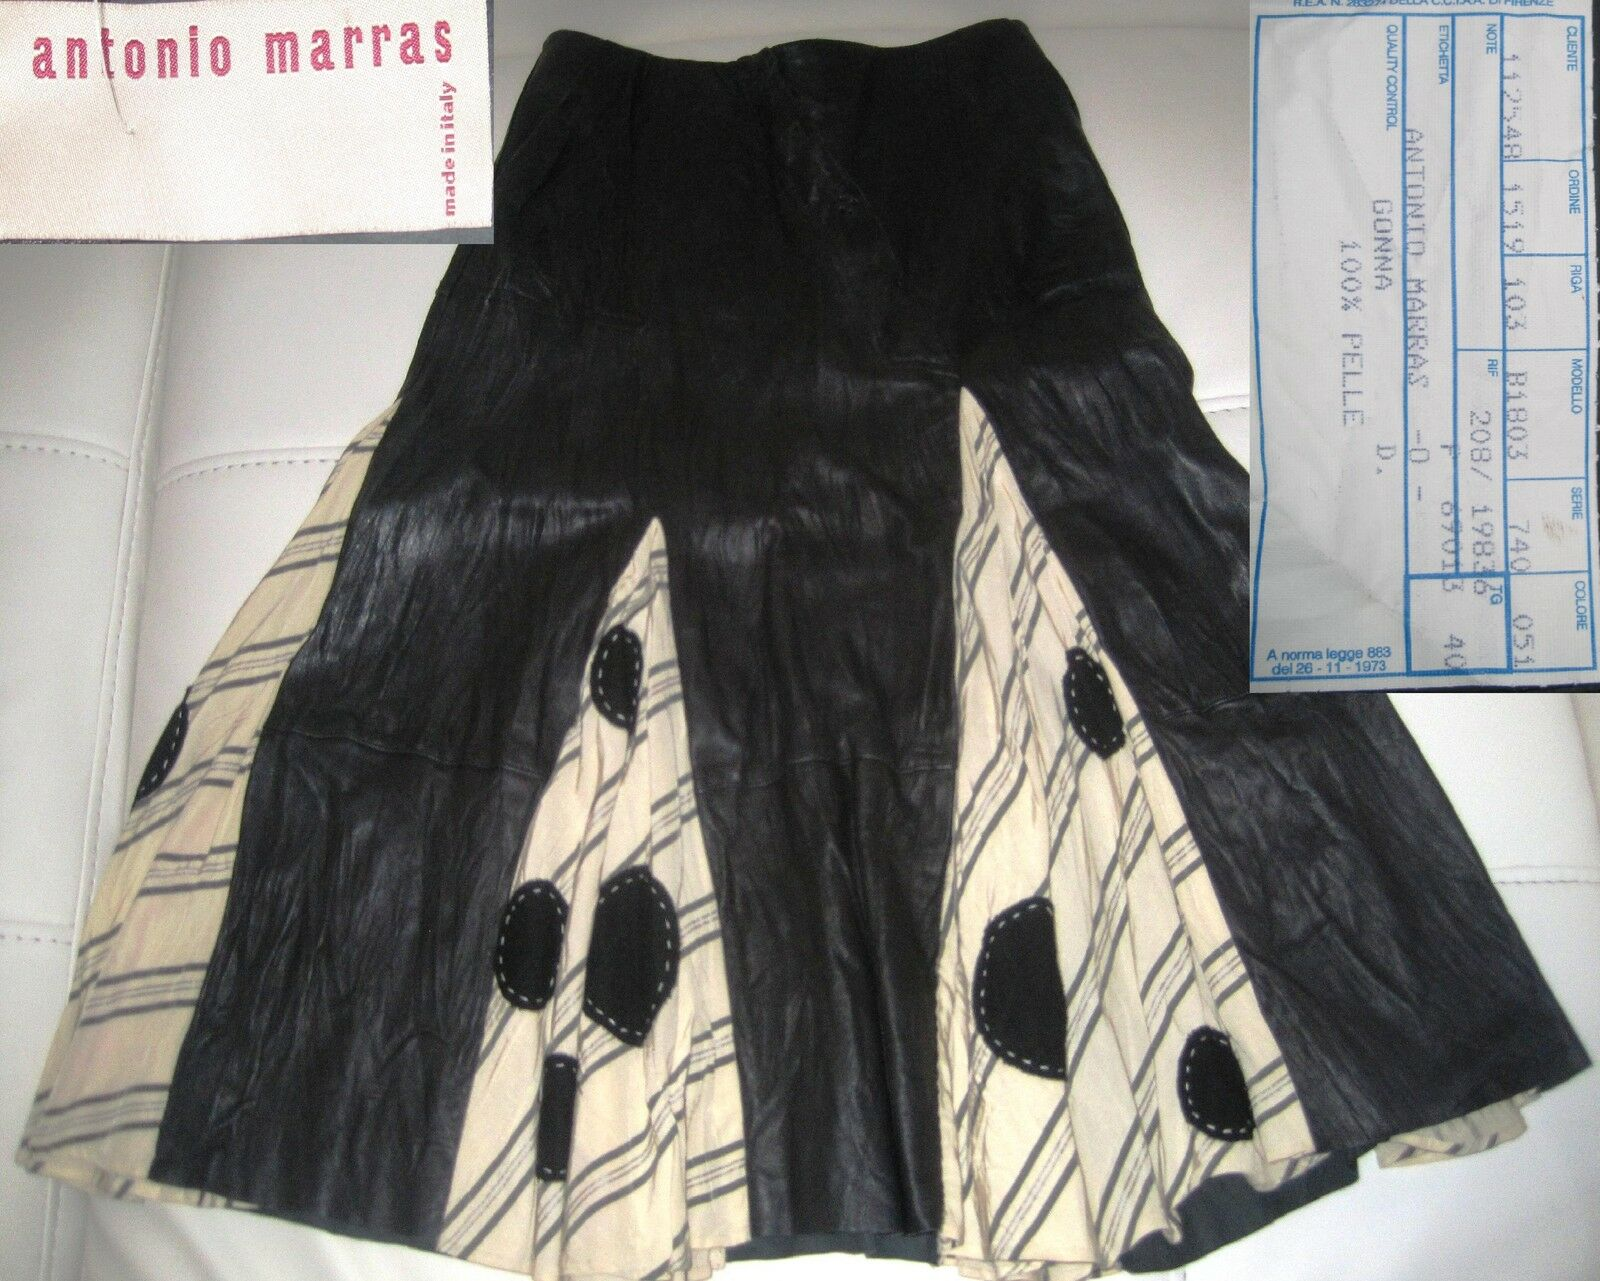 ANTONIO MARRAS Gonna Pelle trend Pois bianco schwarz Skirt Leather Rock Leder